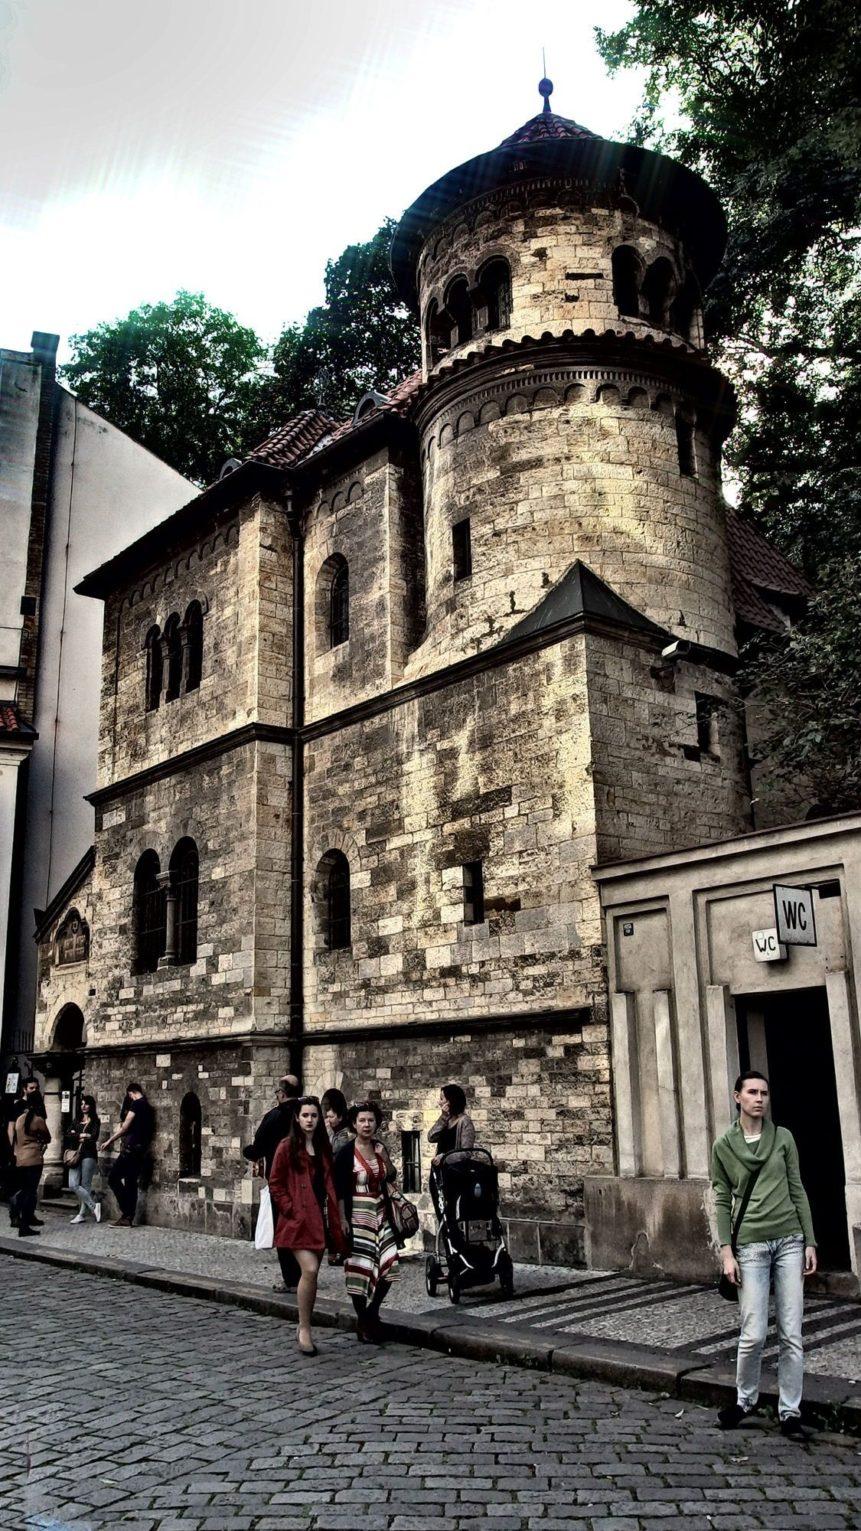 Free photo: Klaus Synagogue